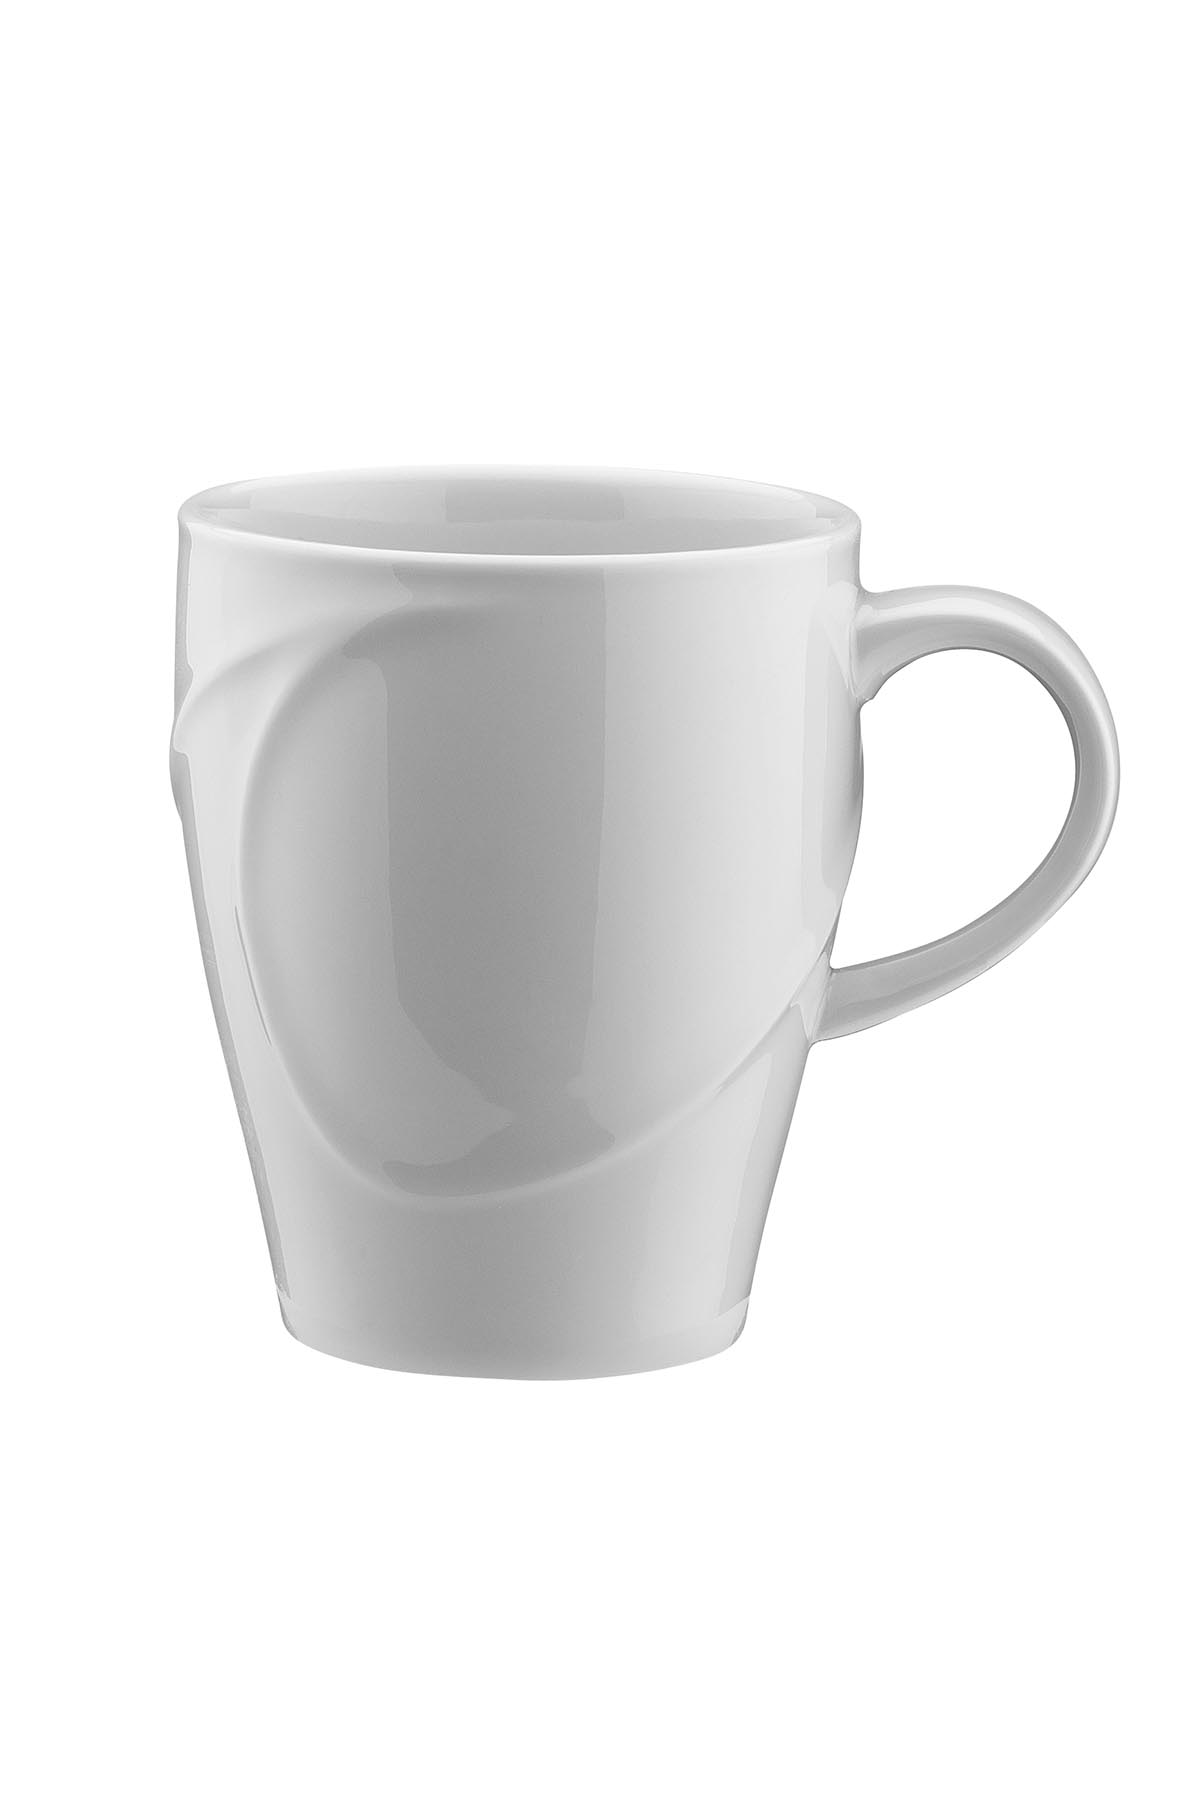 Kütahya Porselen - Kütahya Porselen Spiral Mug Bardak